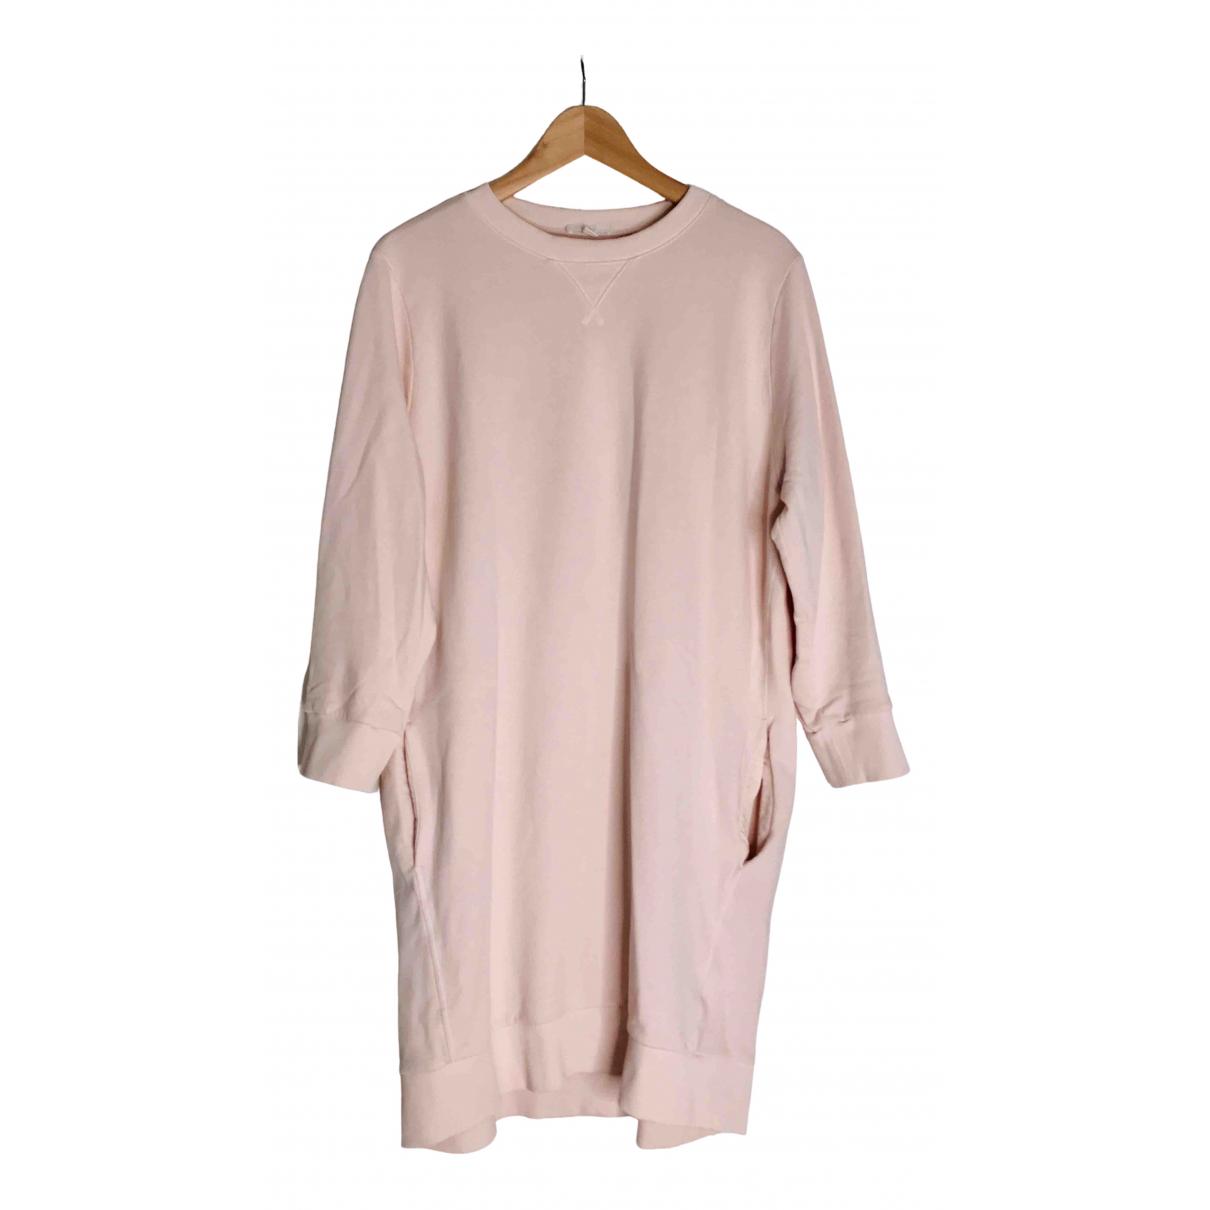 Cos N Pink Cotton Knitwear for Women S International